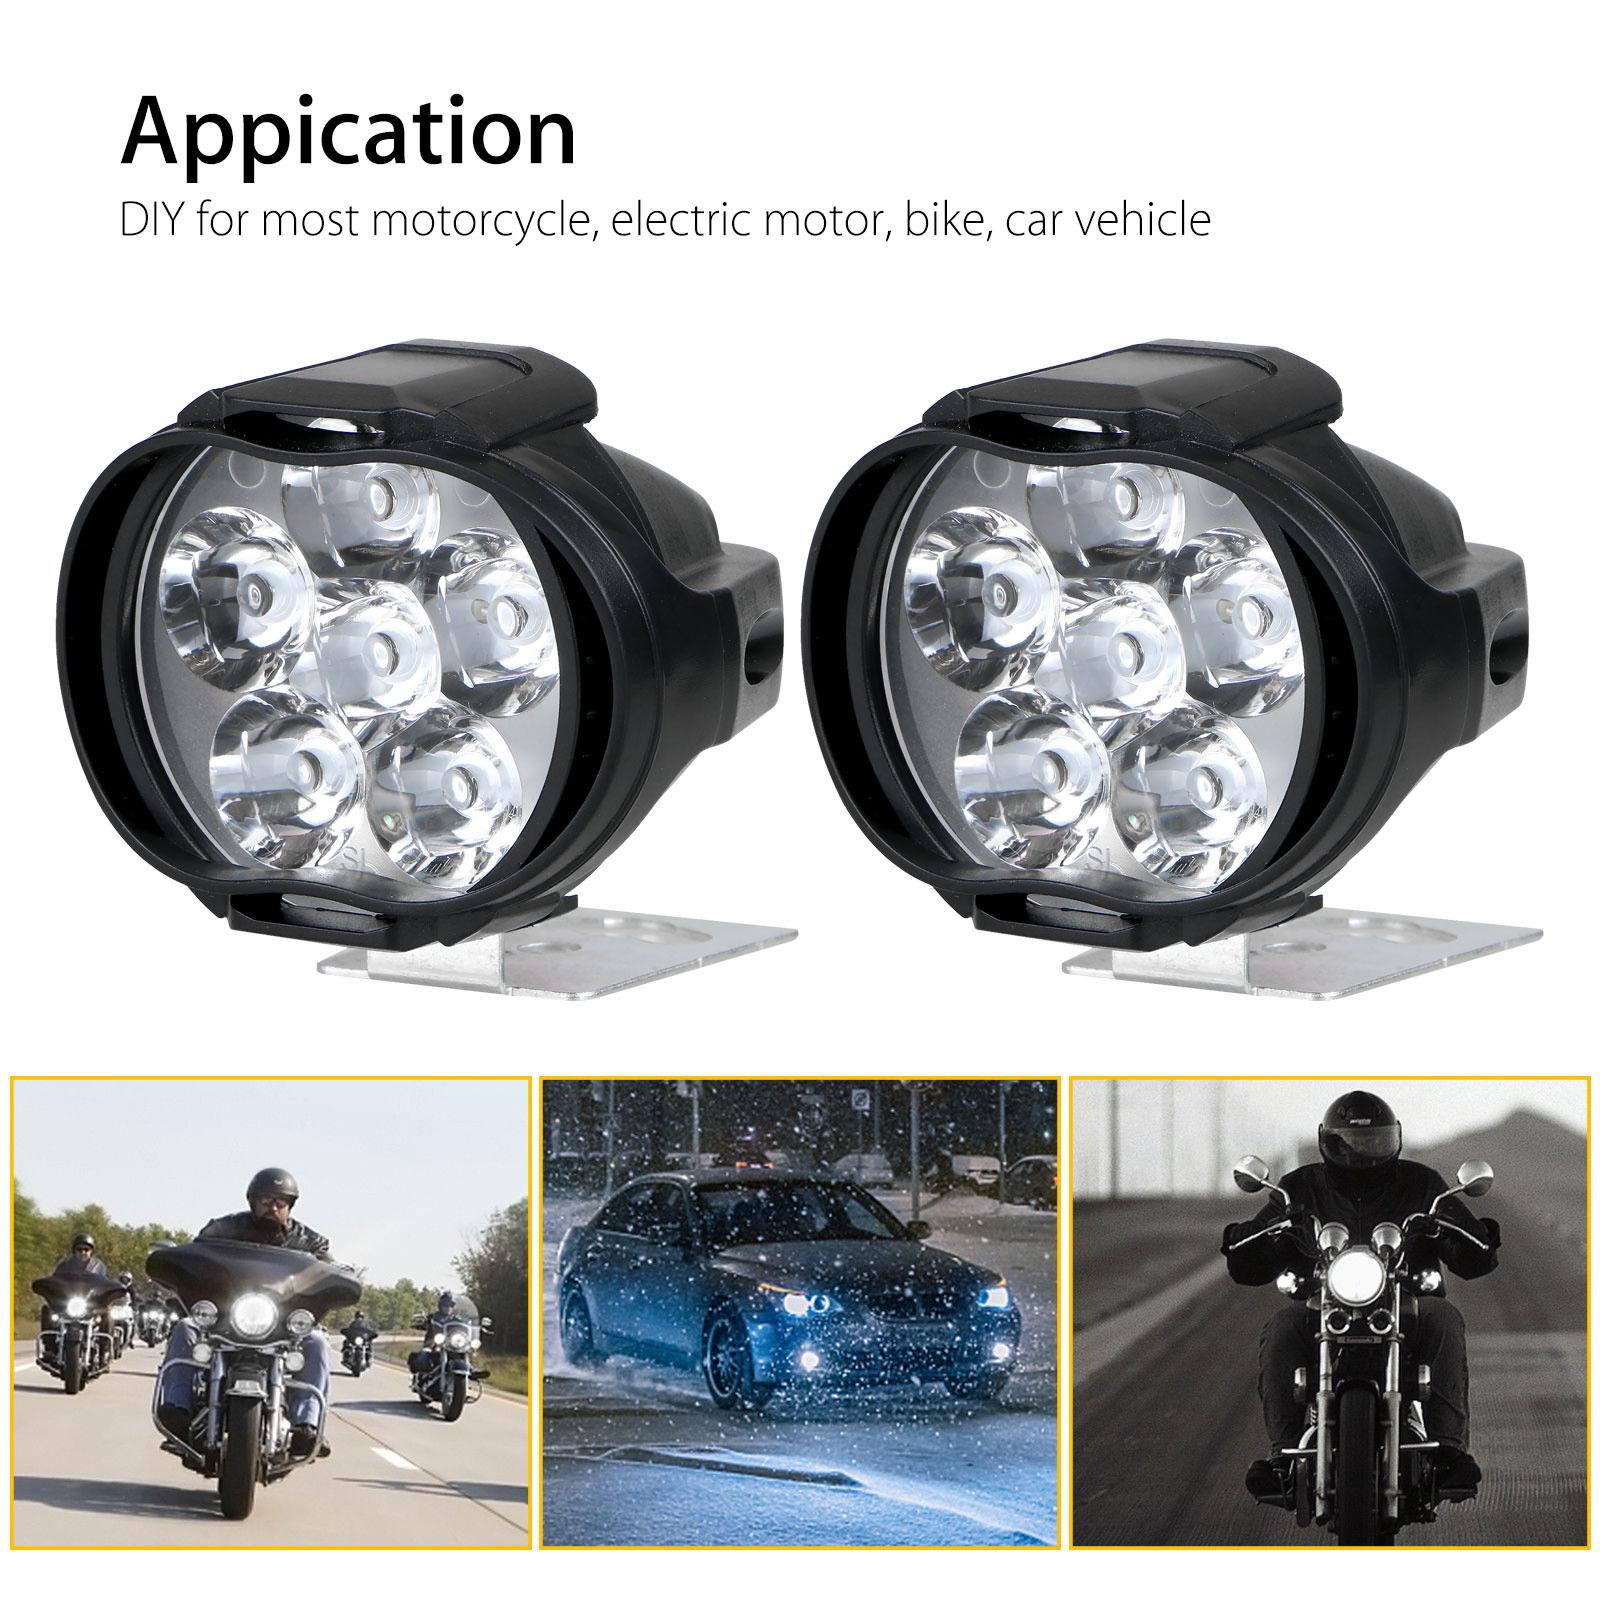 2Pcs-Universal-Car-SUV-Motorcycle-LED-Waterproof-Lights-Fog-Light-Headlight-Lamp thumbnail 6